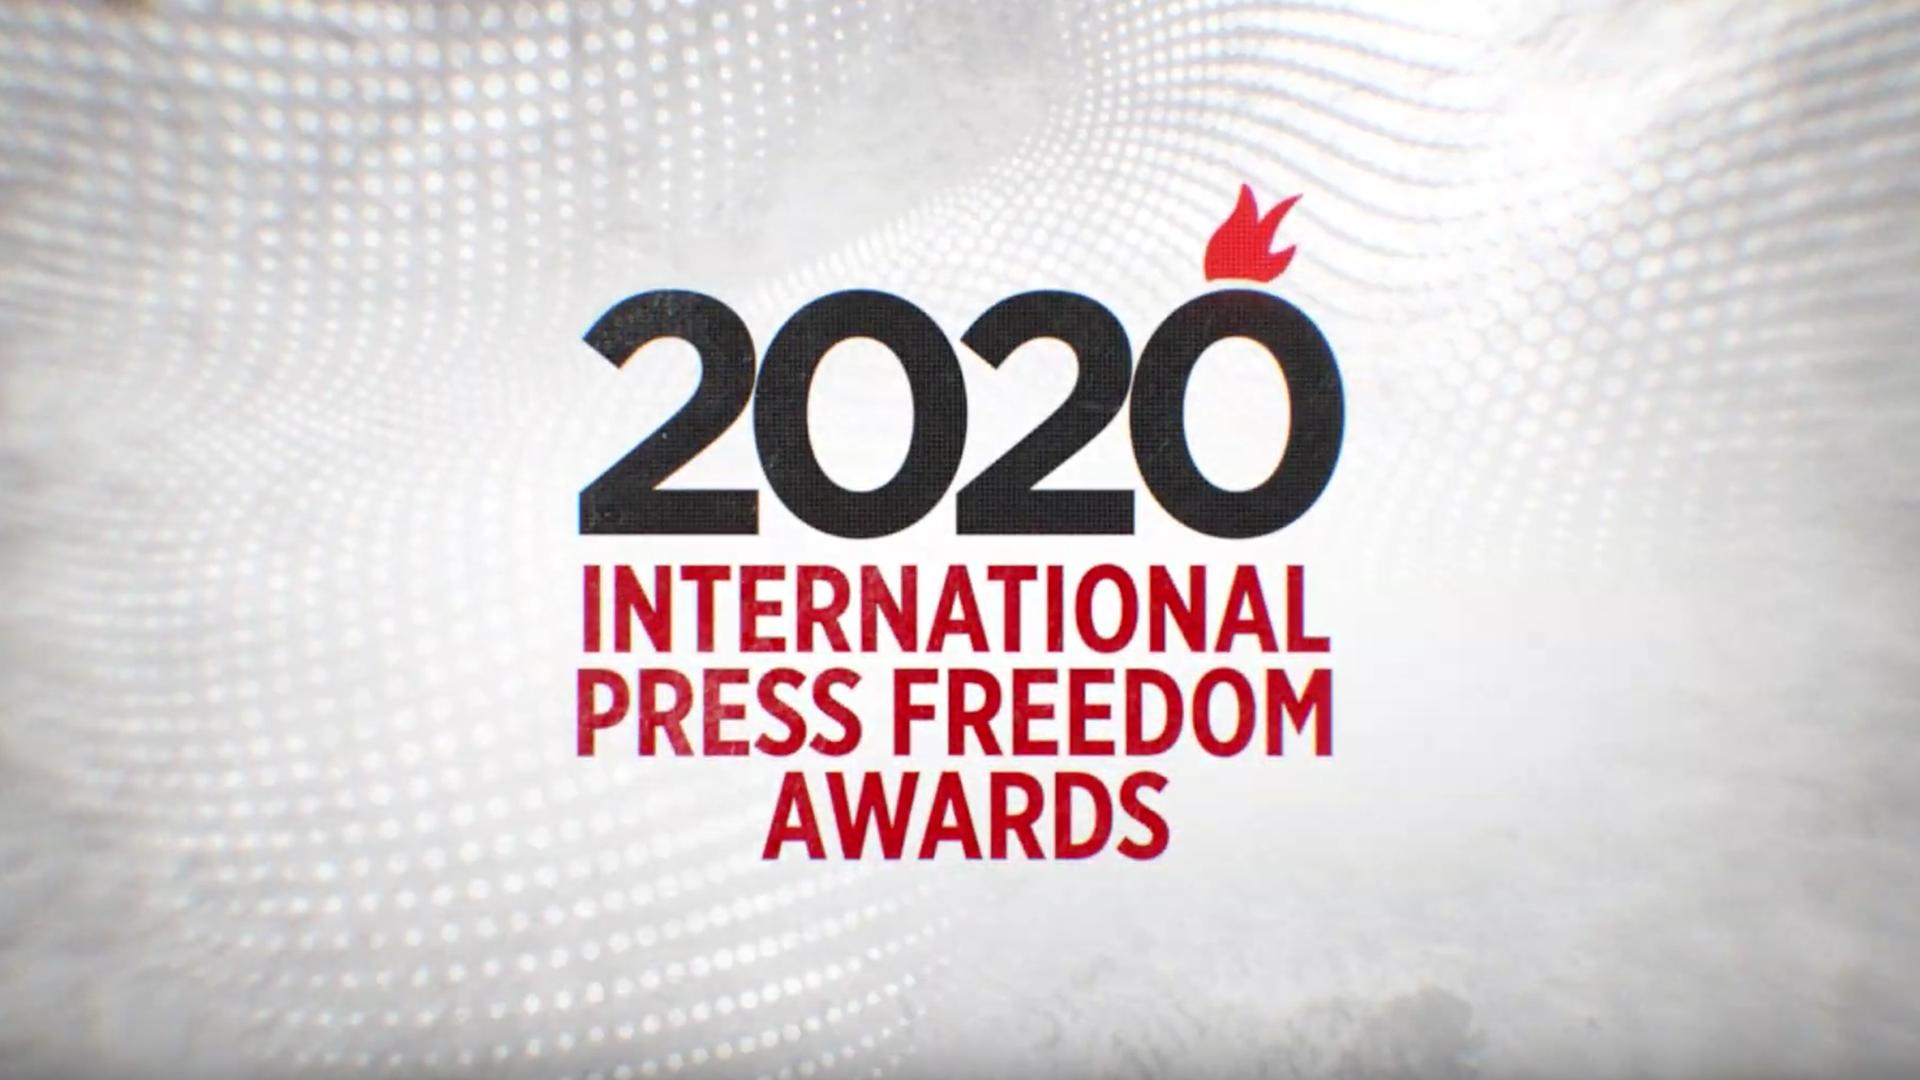 Dapo Olorunyomi, ICIJ board member, lauded for defending press freedom - ICIJ